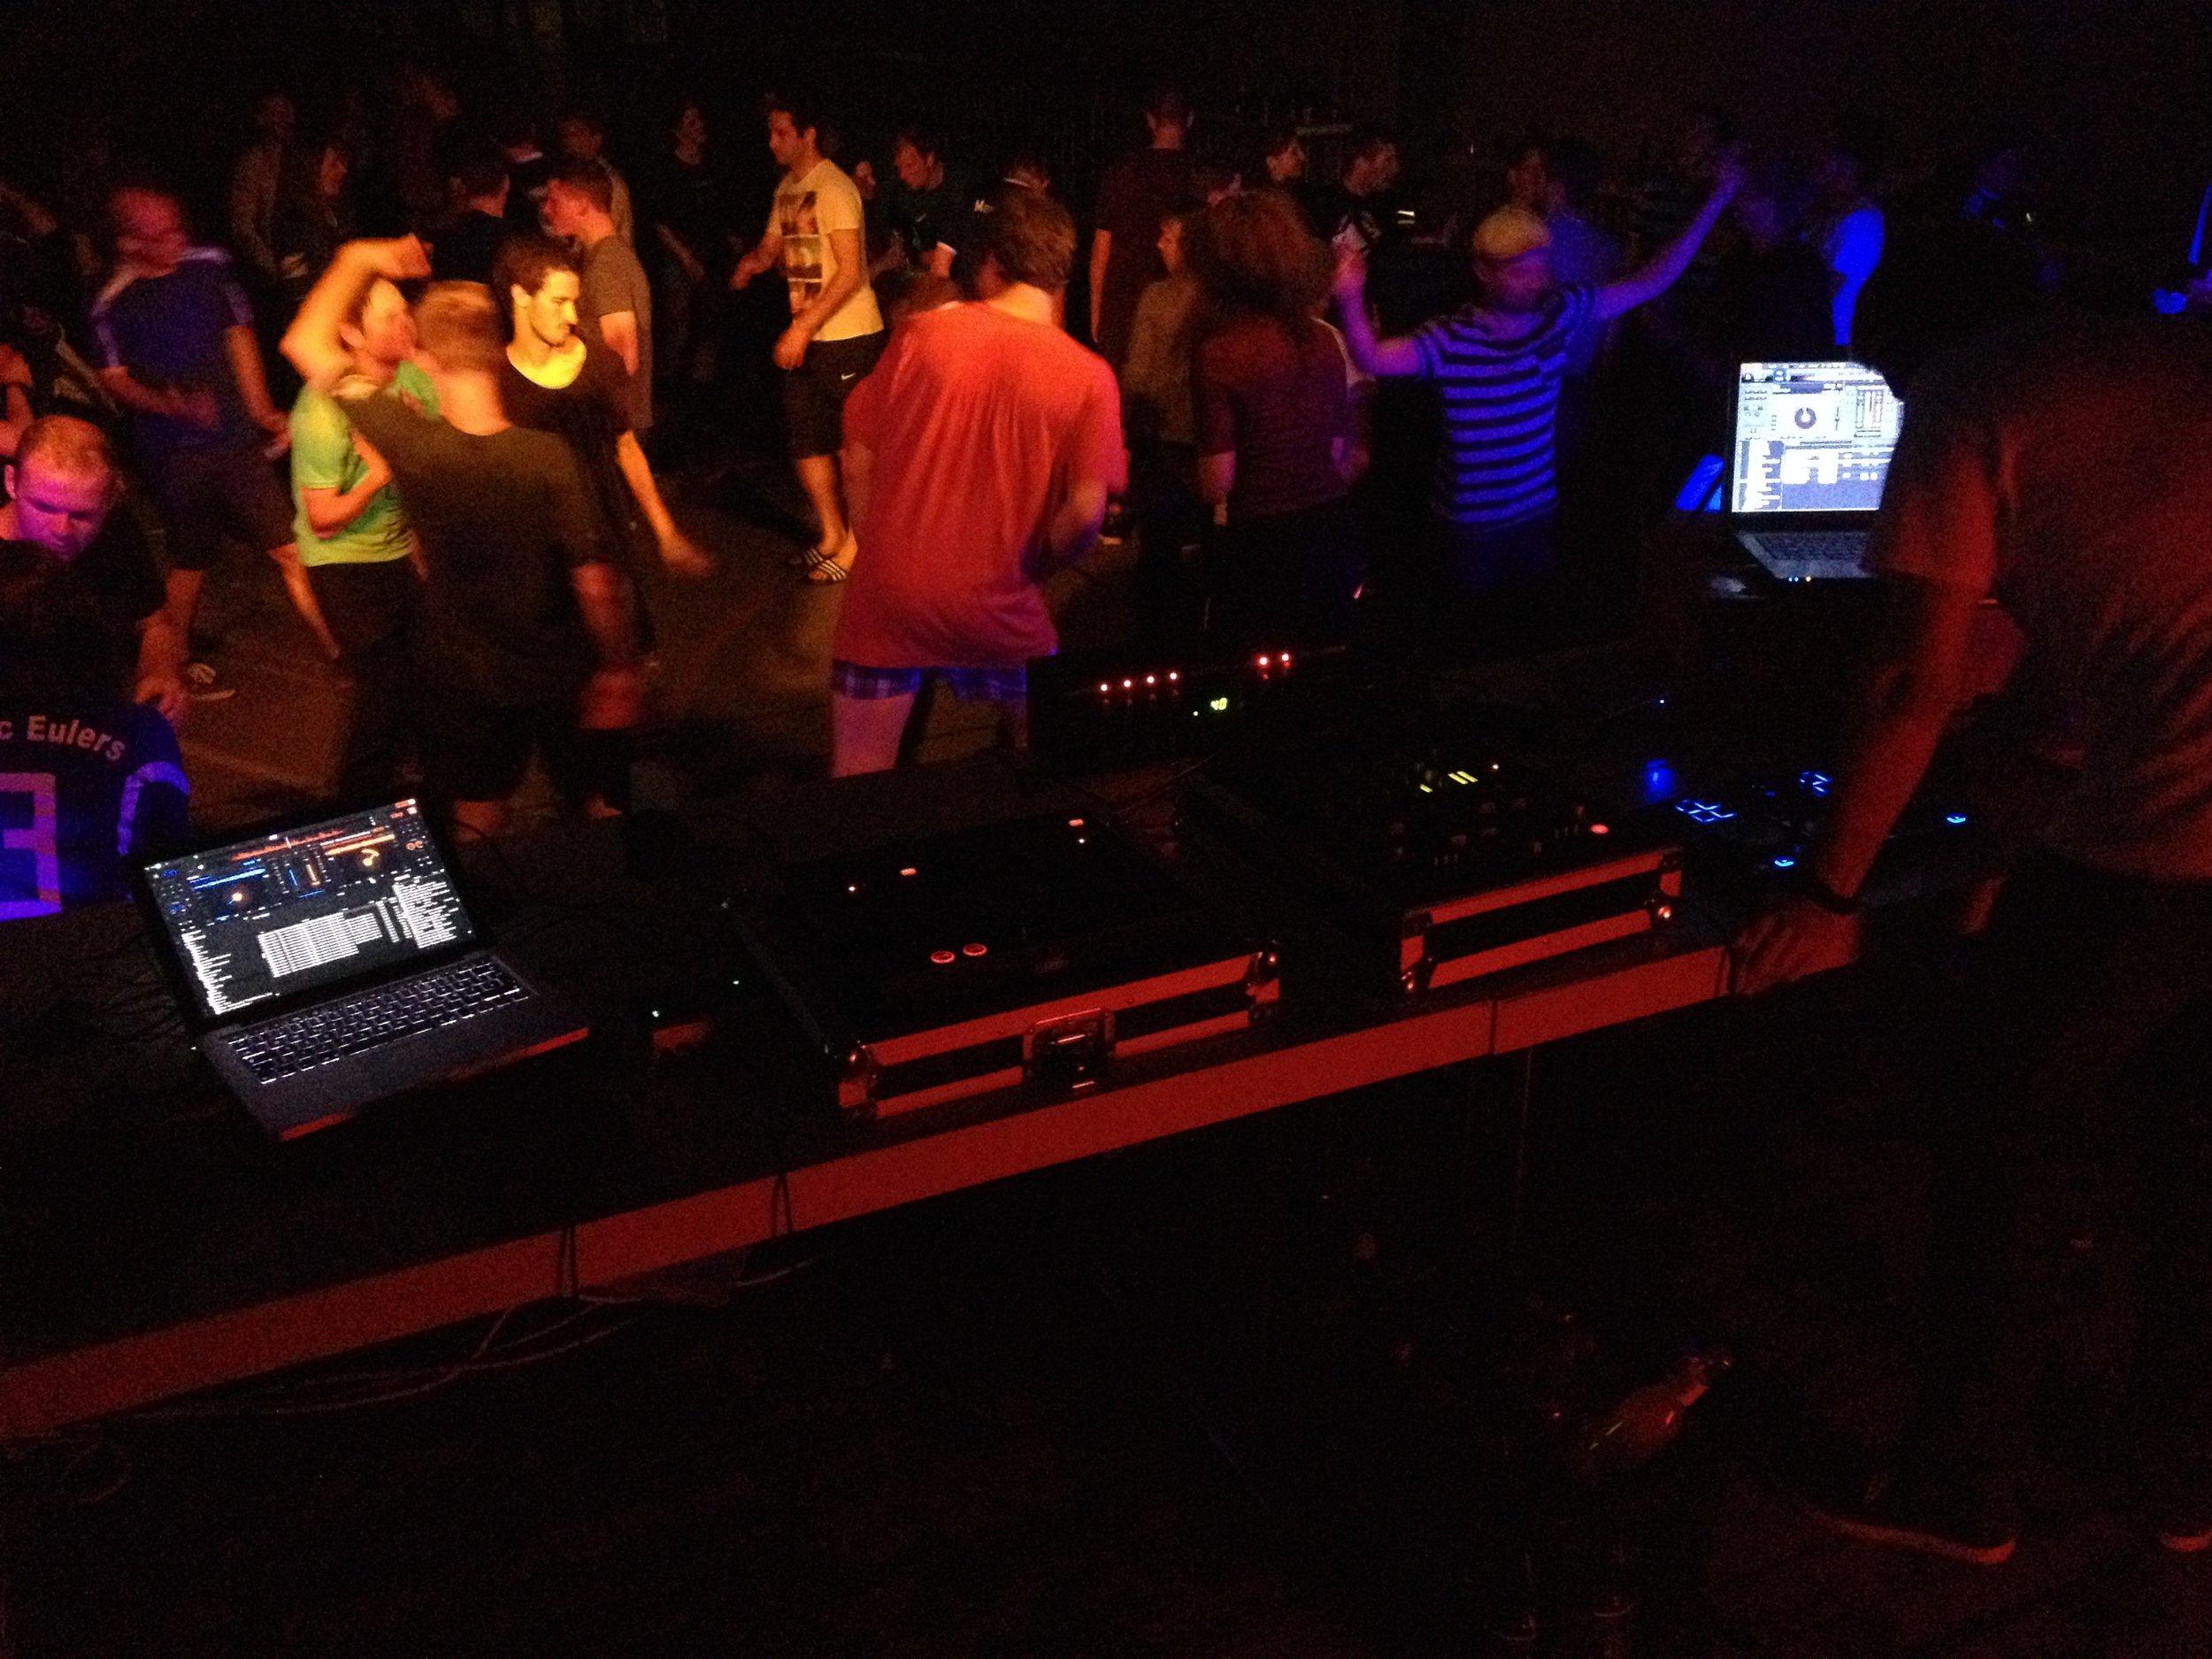 Faultier legt Musik bei Playersparty DFM '16 auf